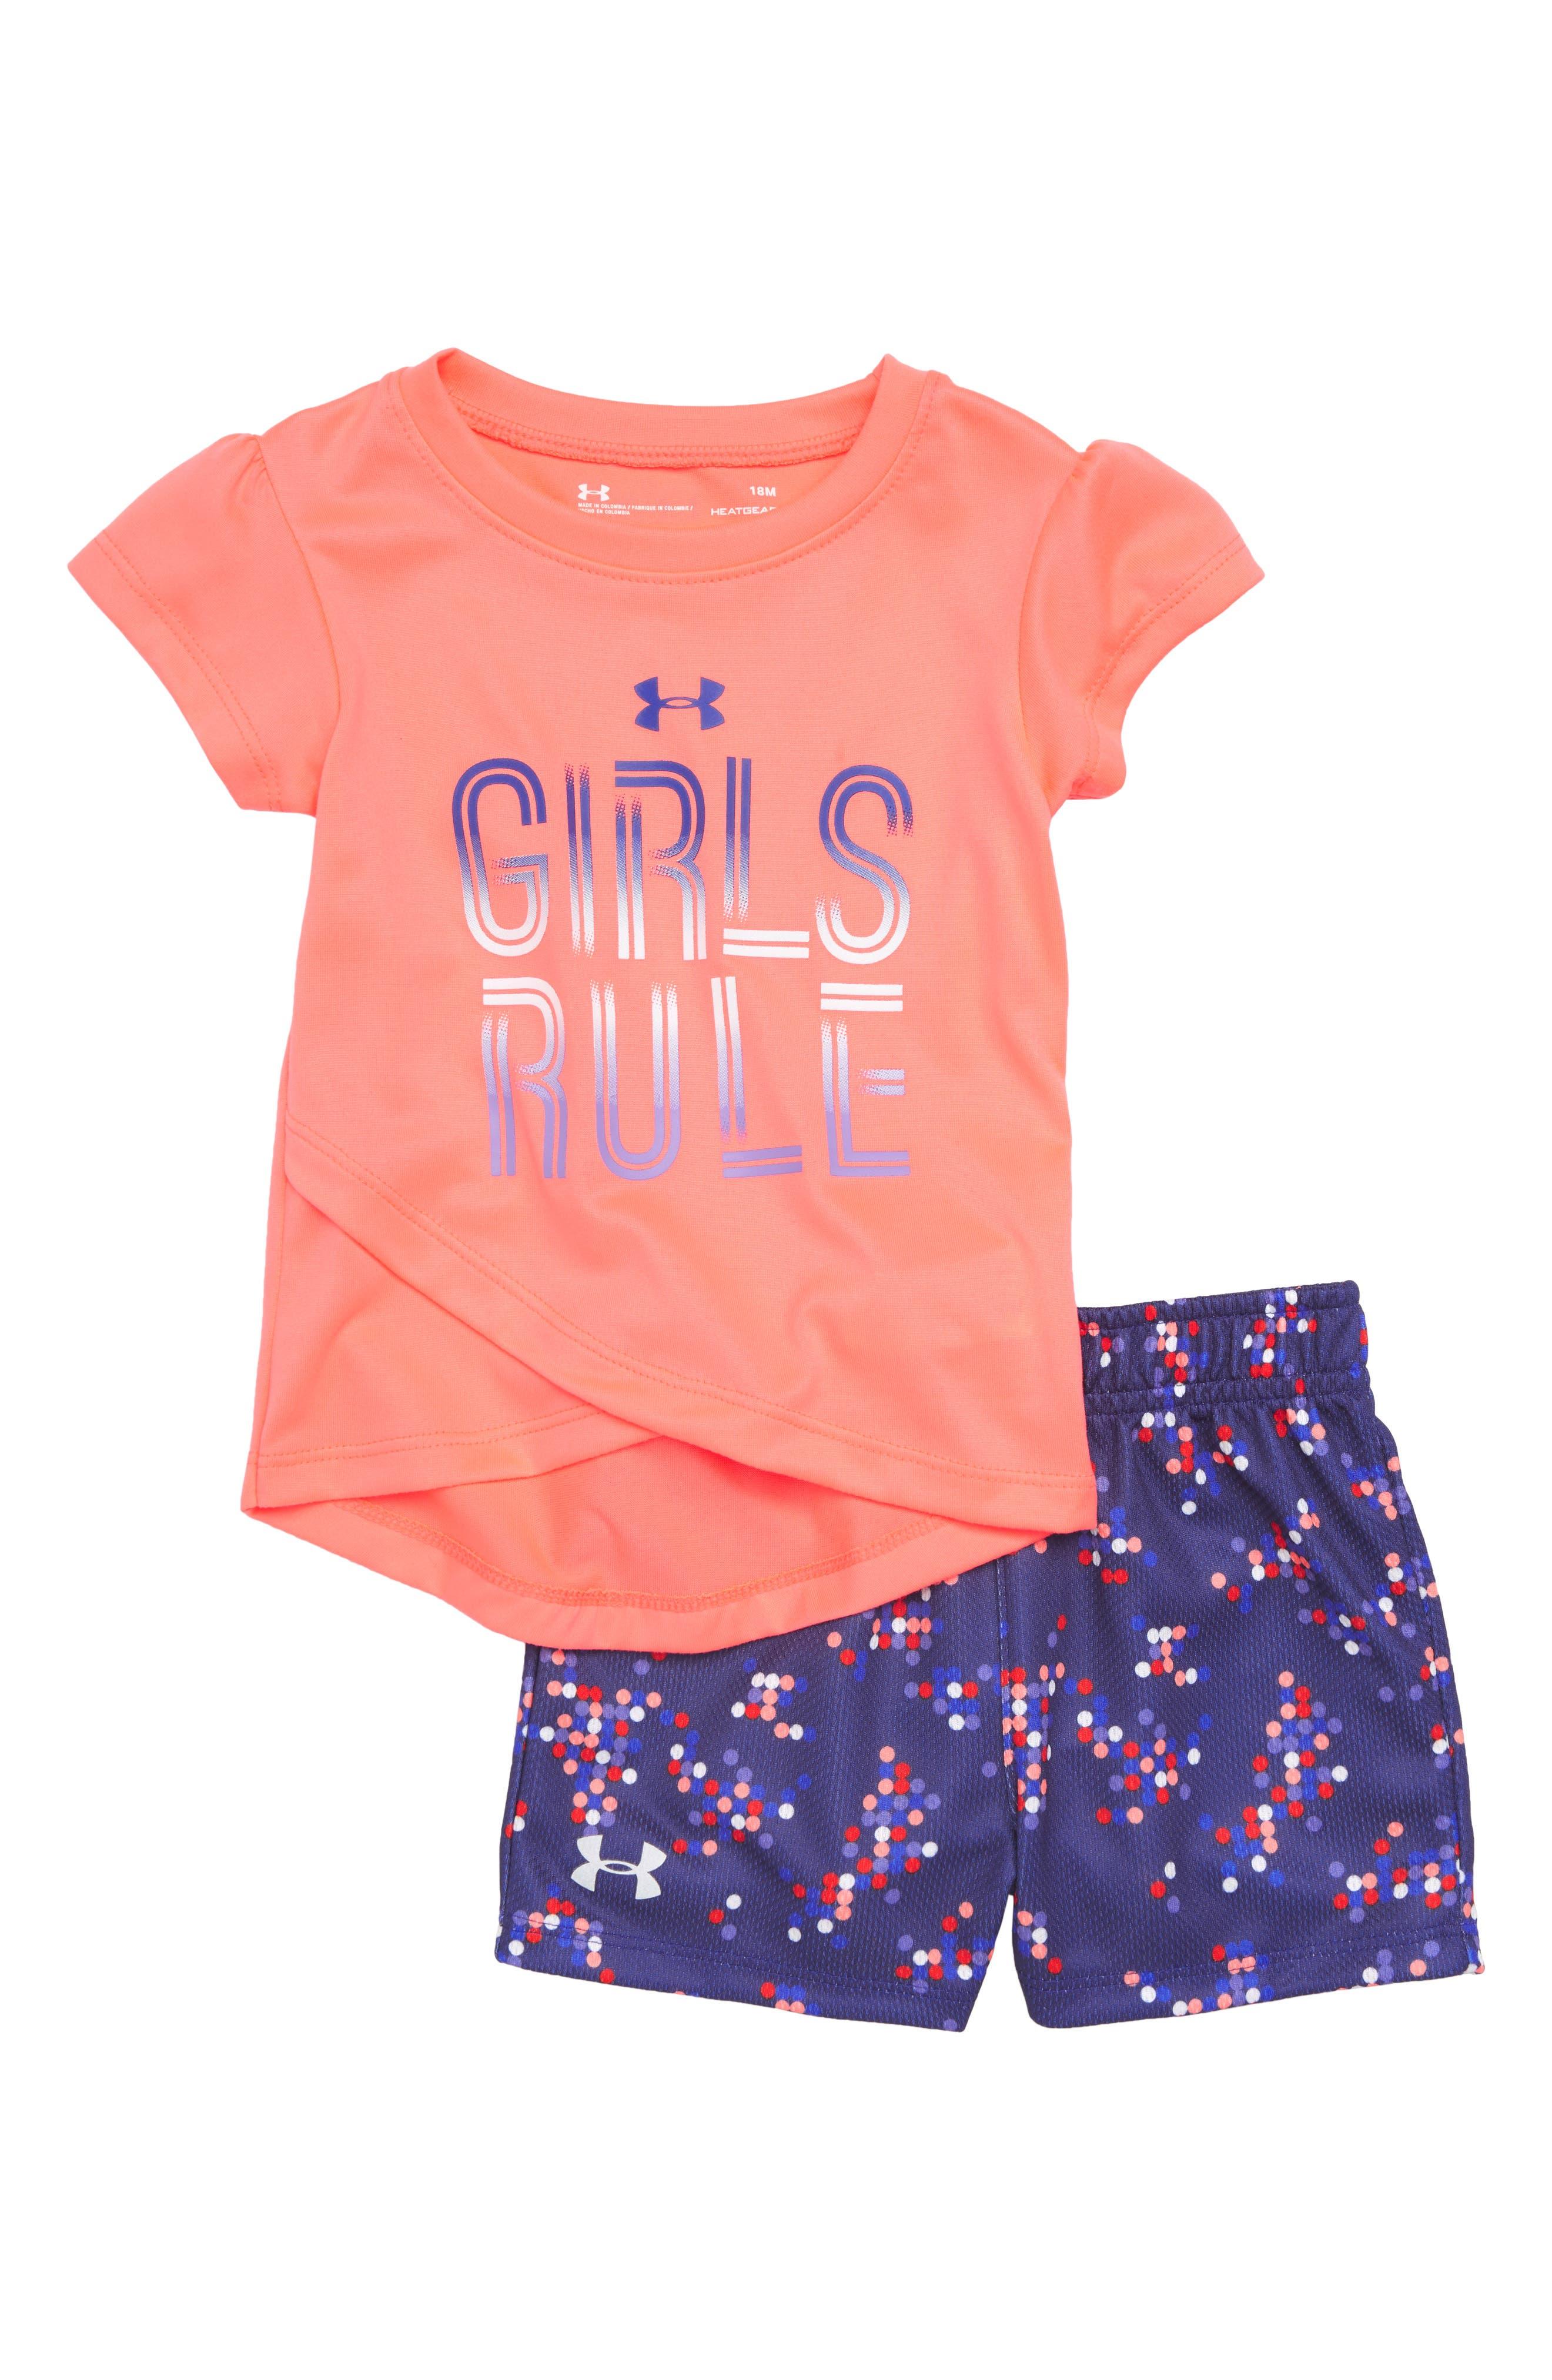 Girls Rule Tee & Shorts Set,                             Main thumbnail 1, color,                             950